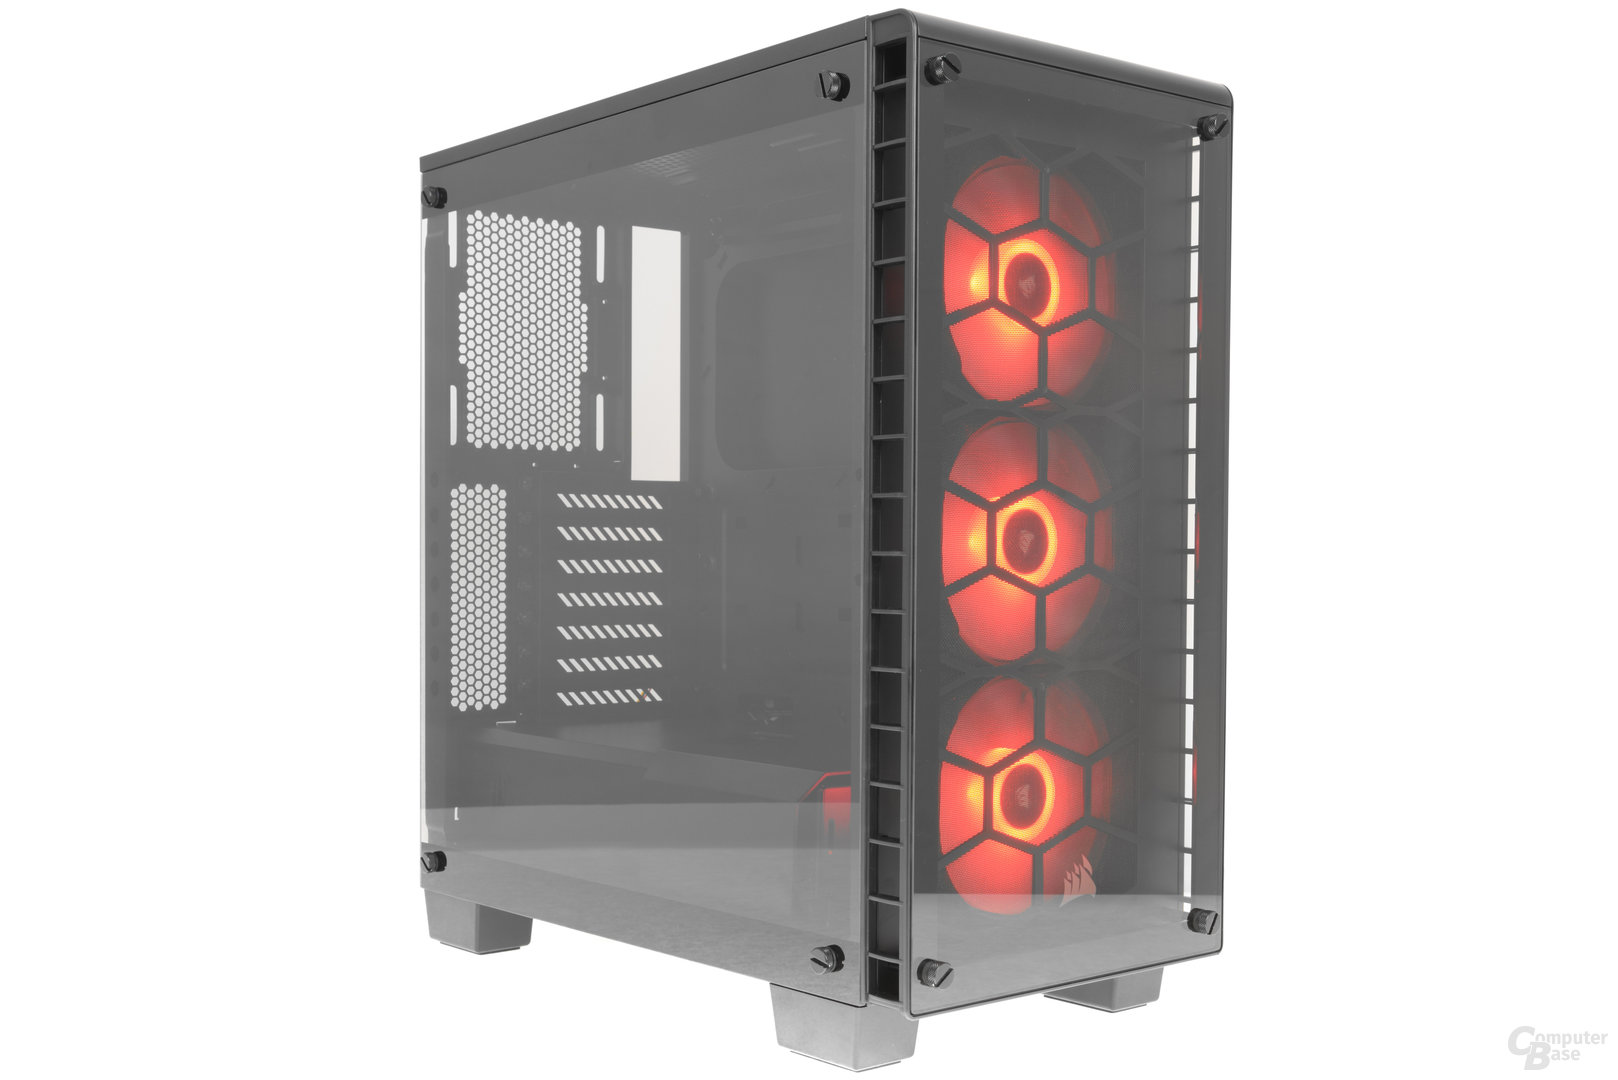 Corsair Crystal 460X RGB – LED-Beleuchtung aktiv